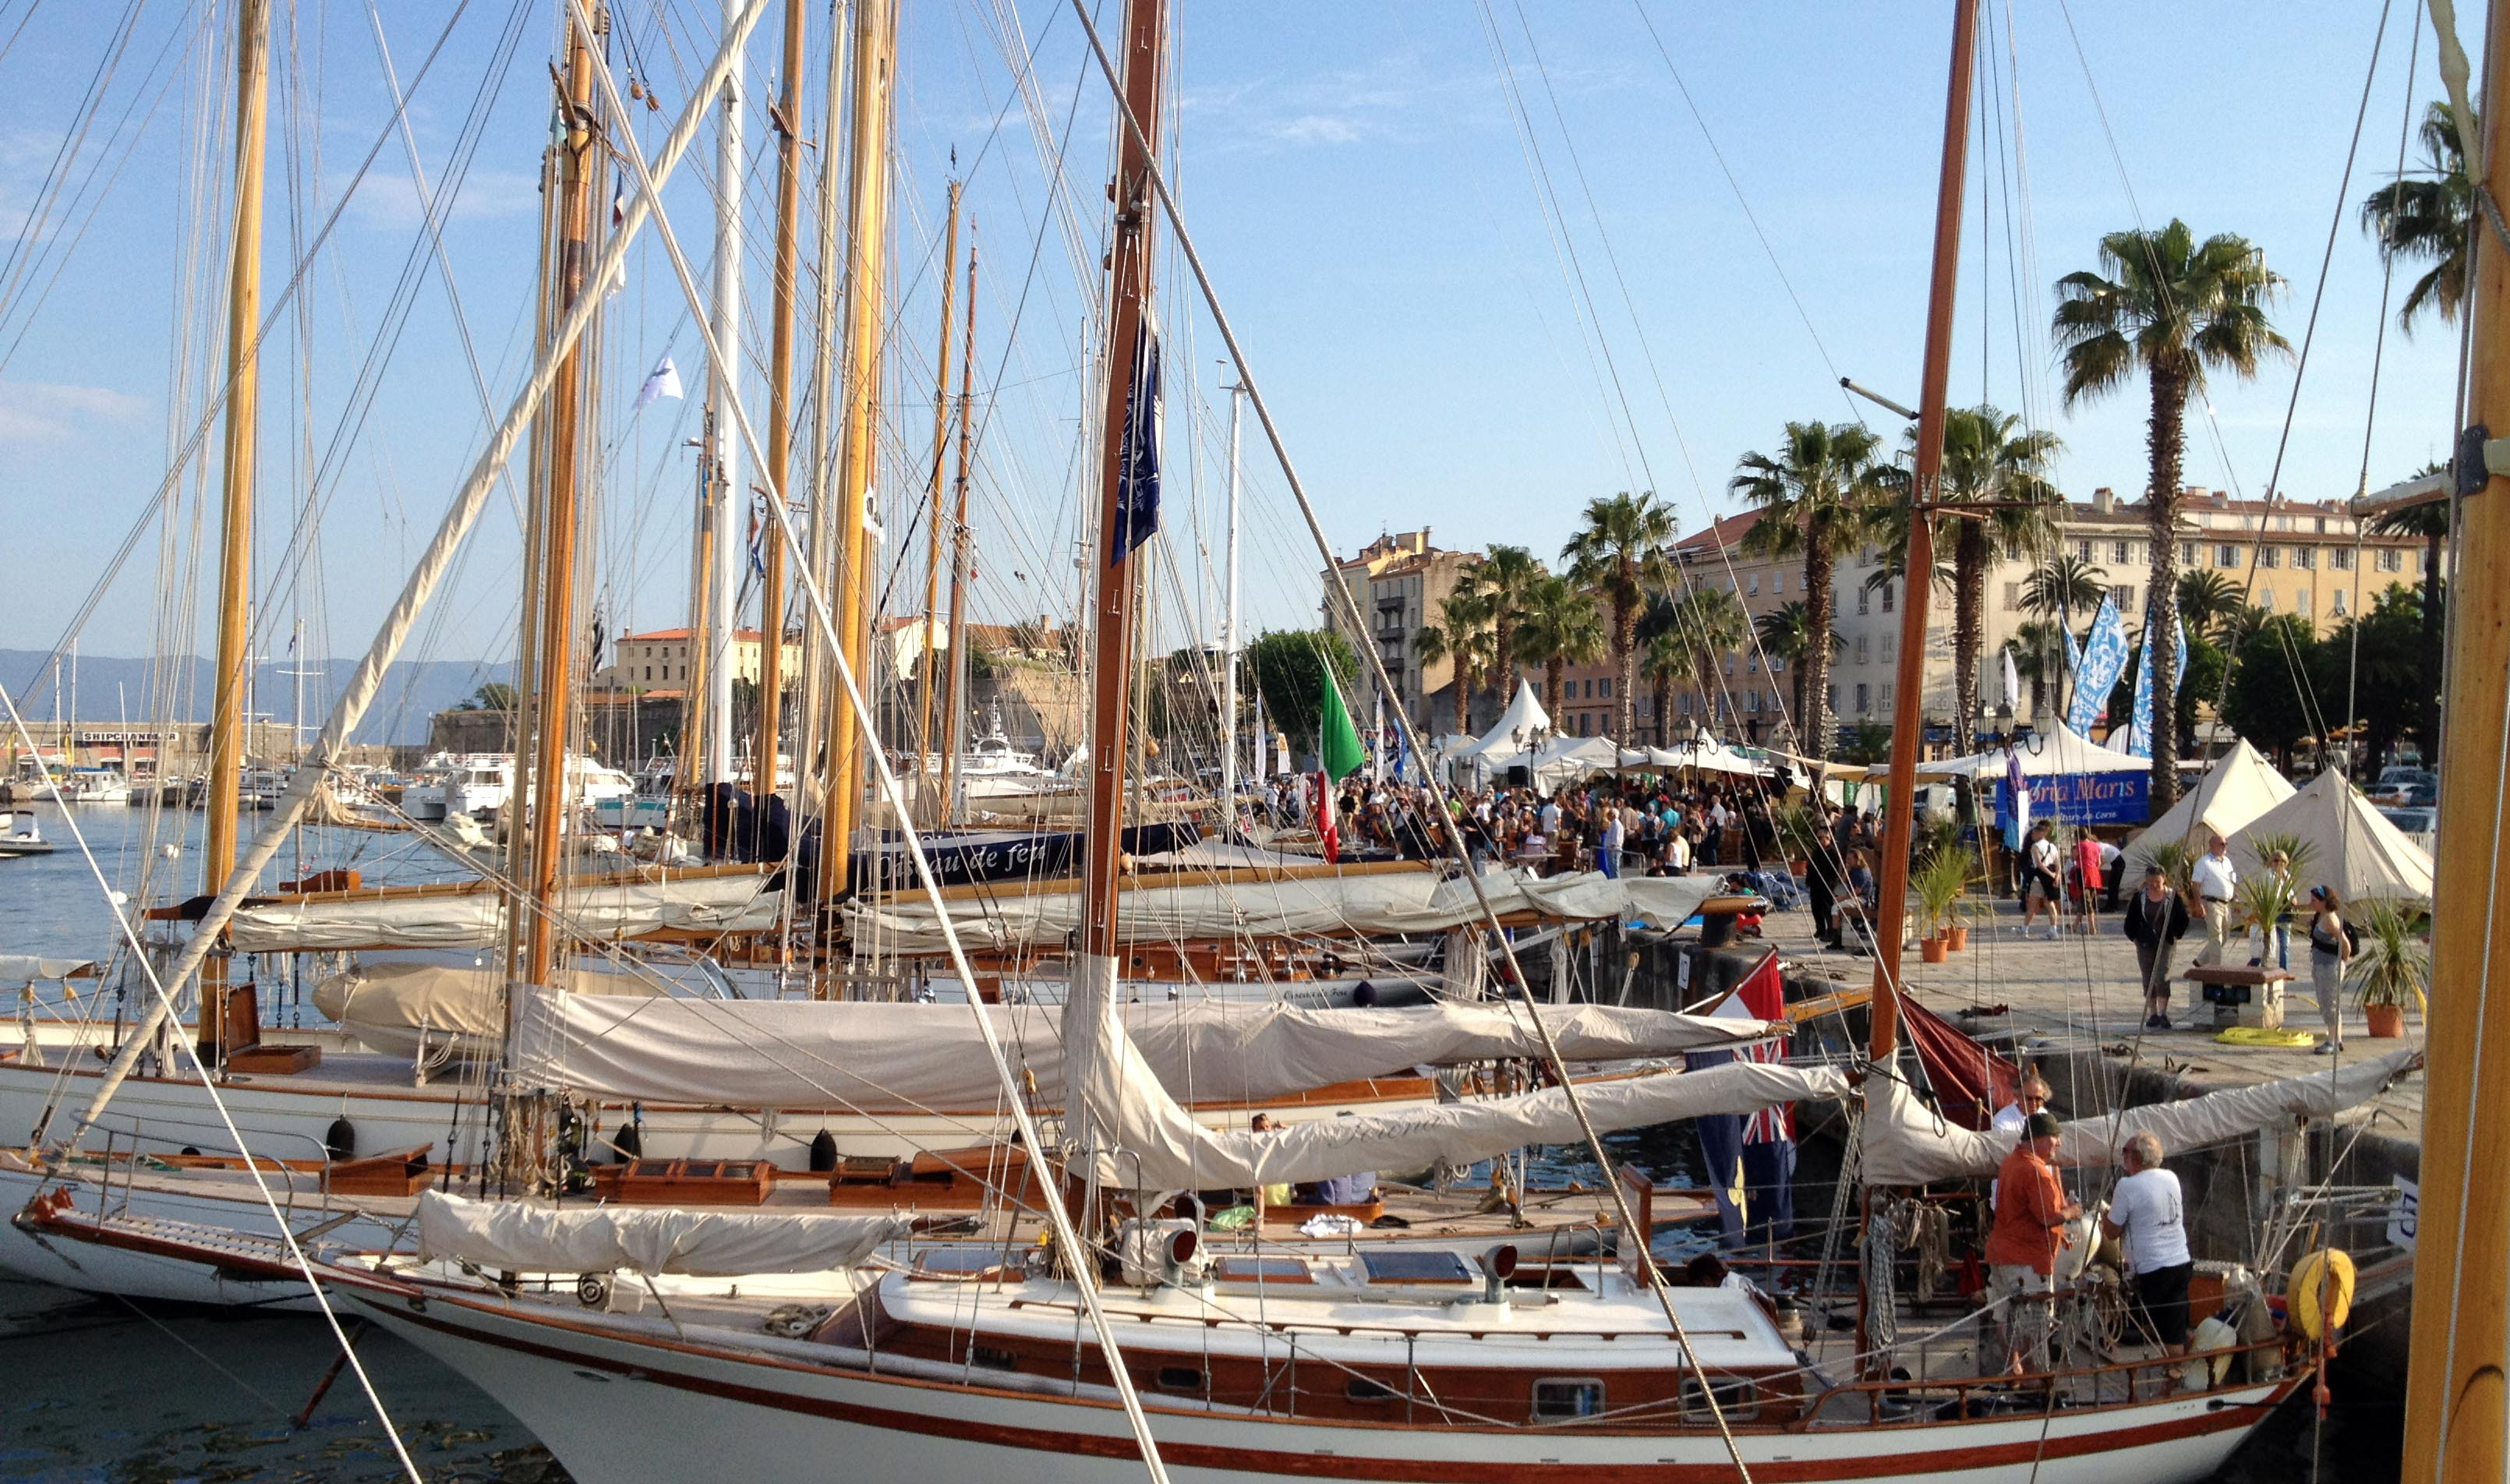 RI 2009 Quai d'honneur Brancaleoni port Tino Rossi photo Thibaud Assante DR